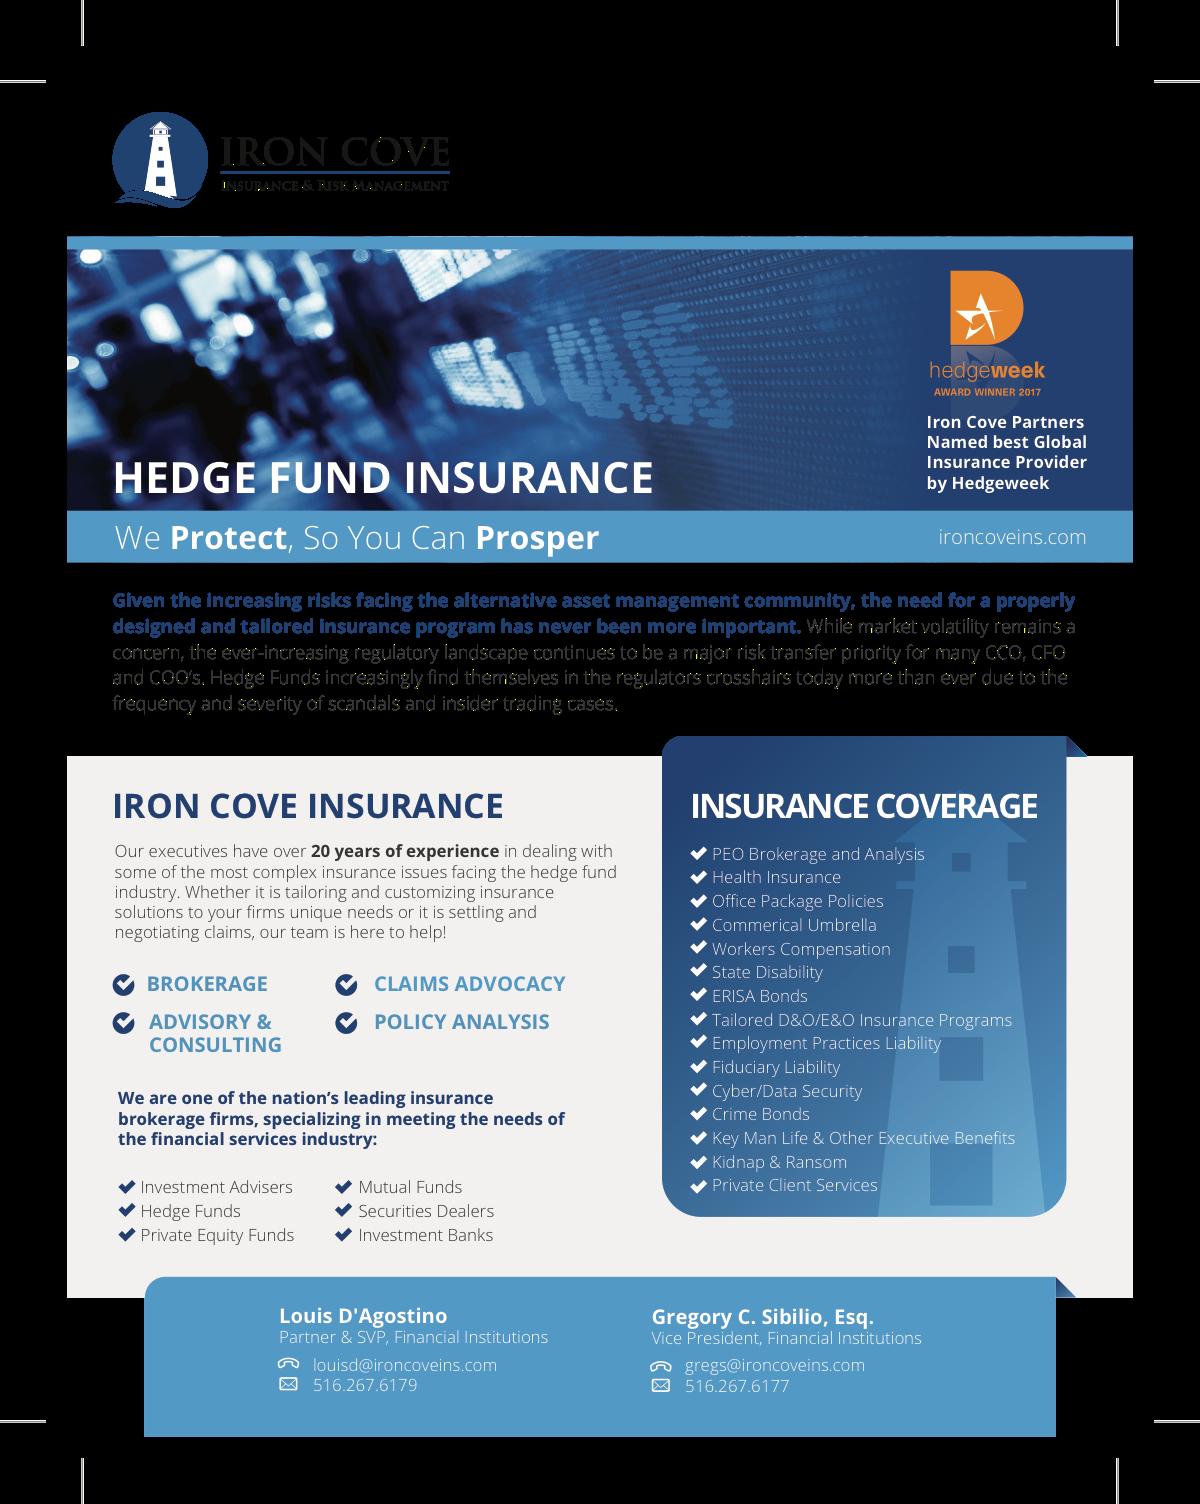 Hedge Fund Brochure Add-On